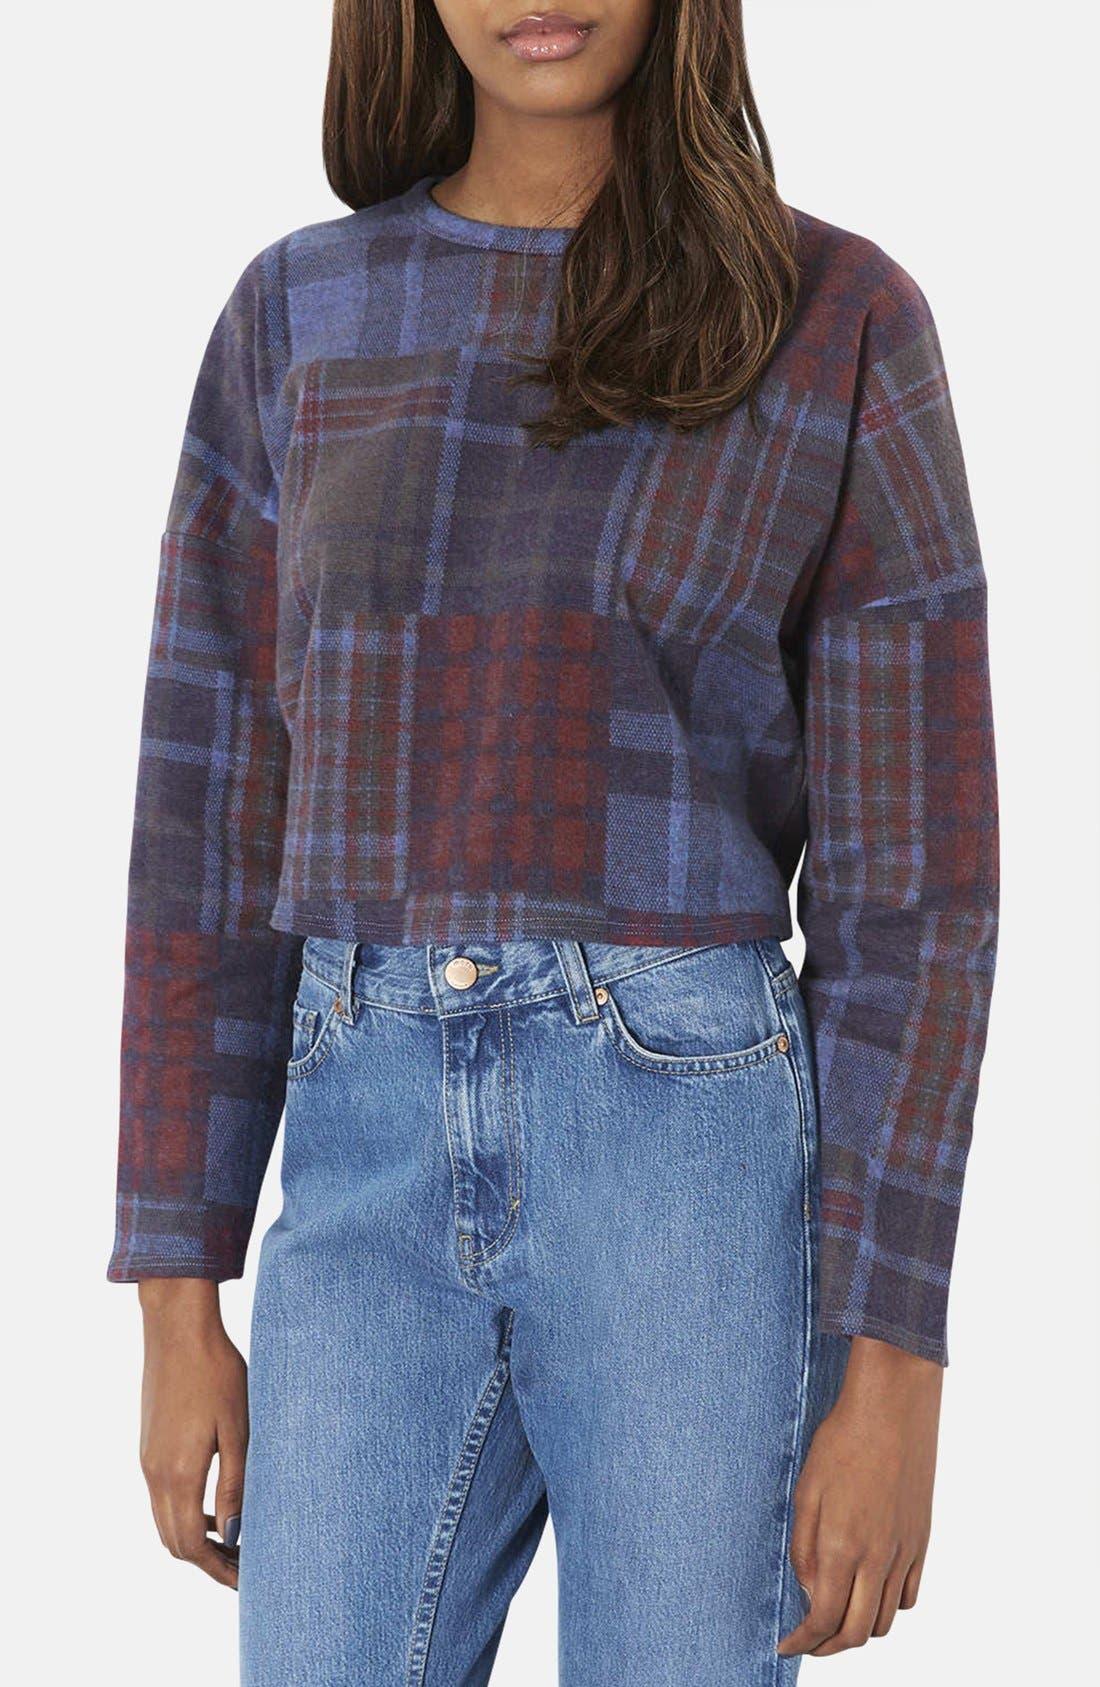 Alternate Image 1 Selected - Topshop Boxy Check Print Cotton Sweatshirt